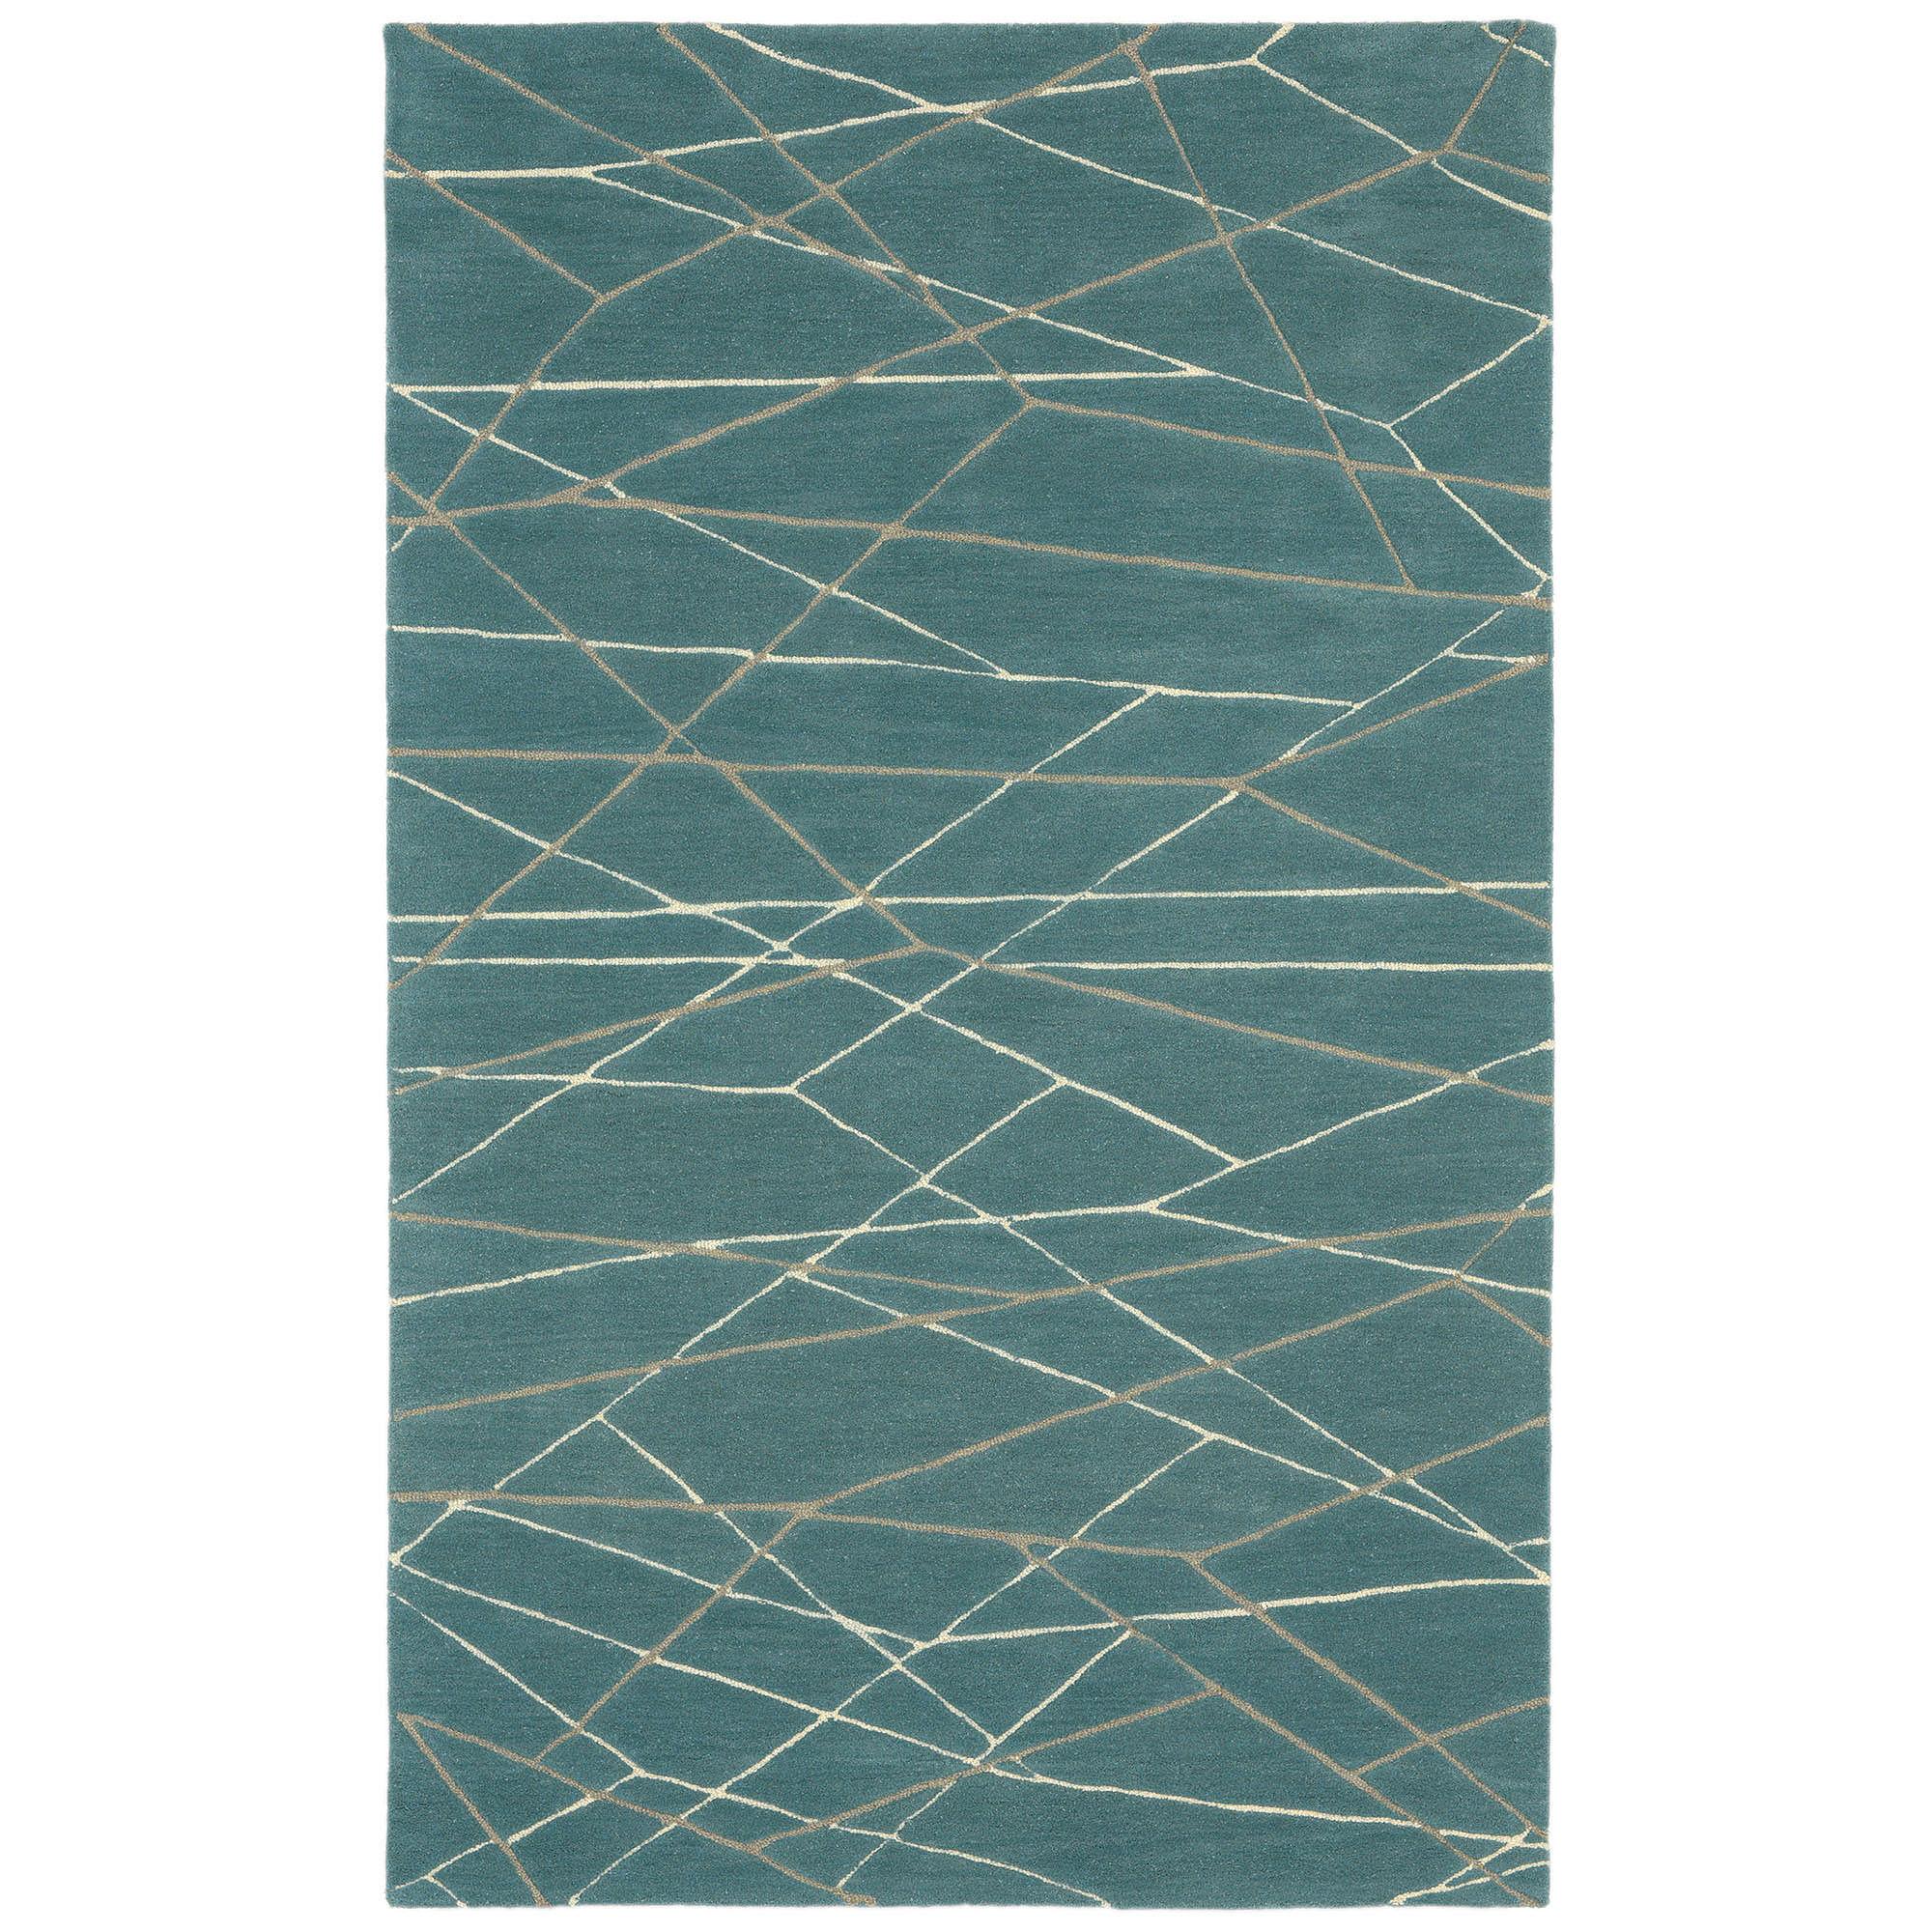 Liora Manne Seville Lines Hand Tufted Rectangular Rugs